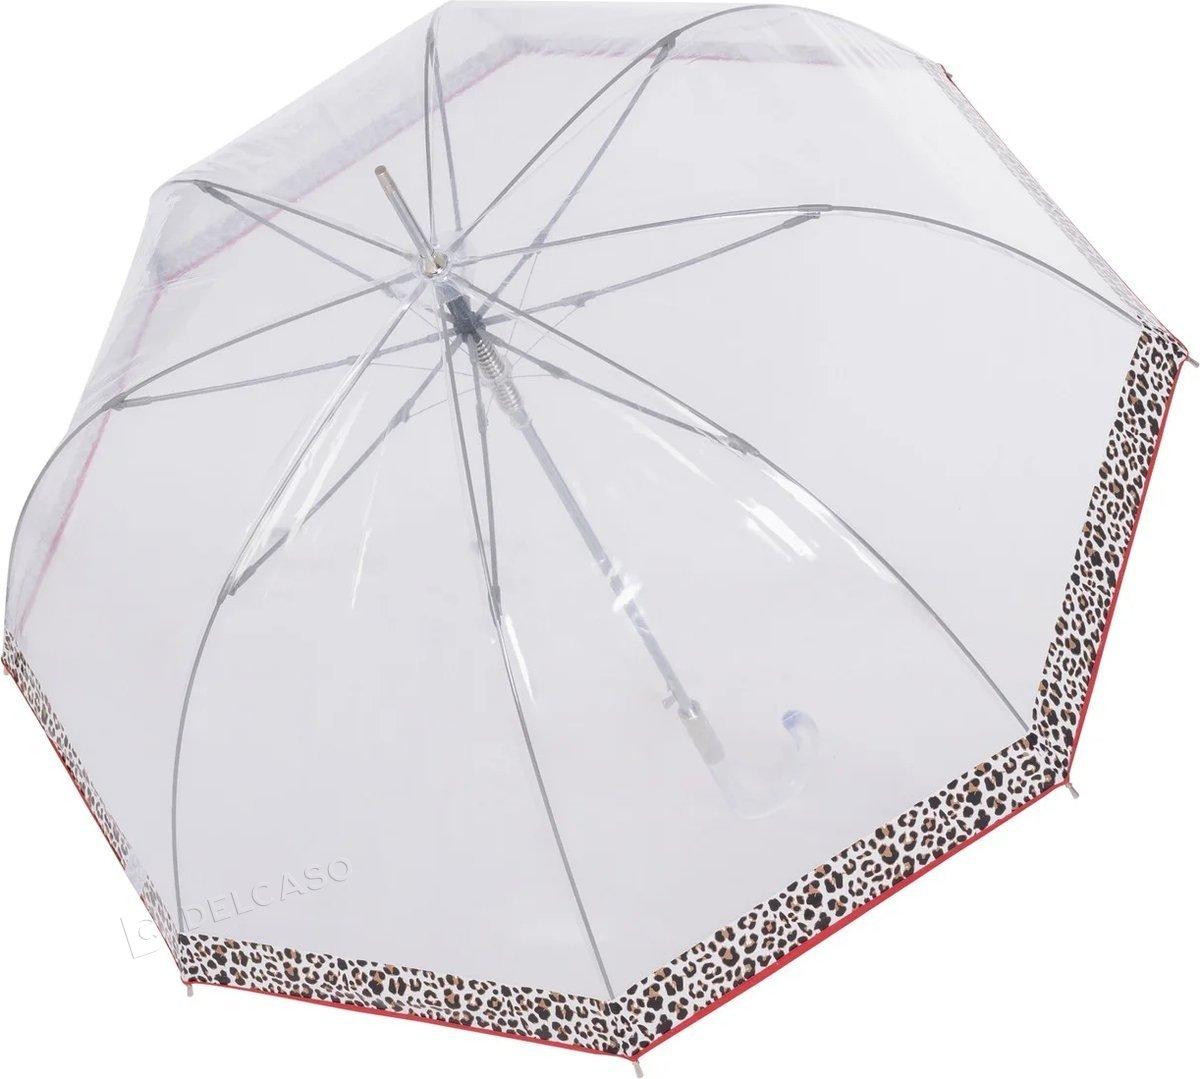 Parasol przeźroczysty Fiber Lang Doppler Leo